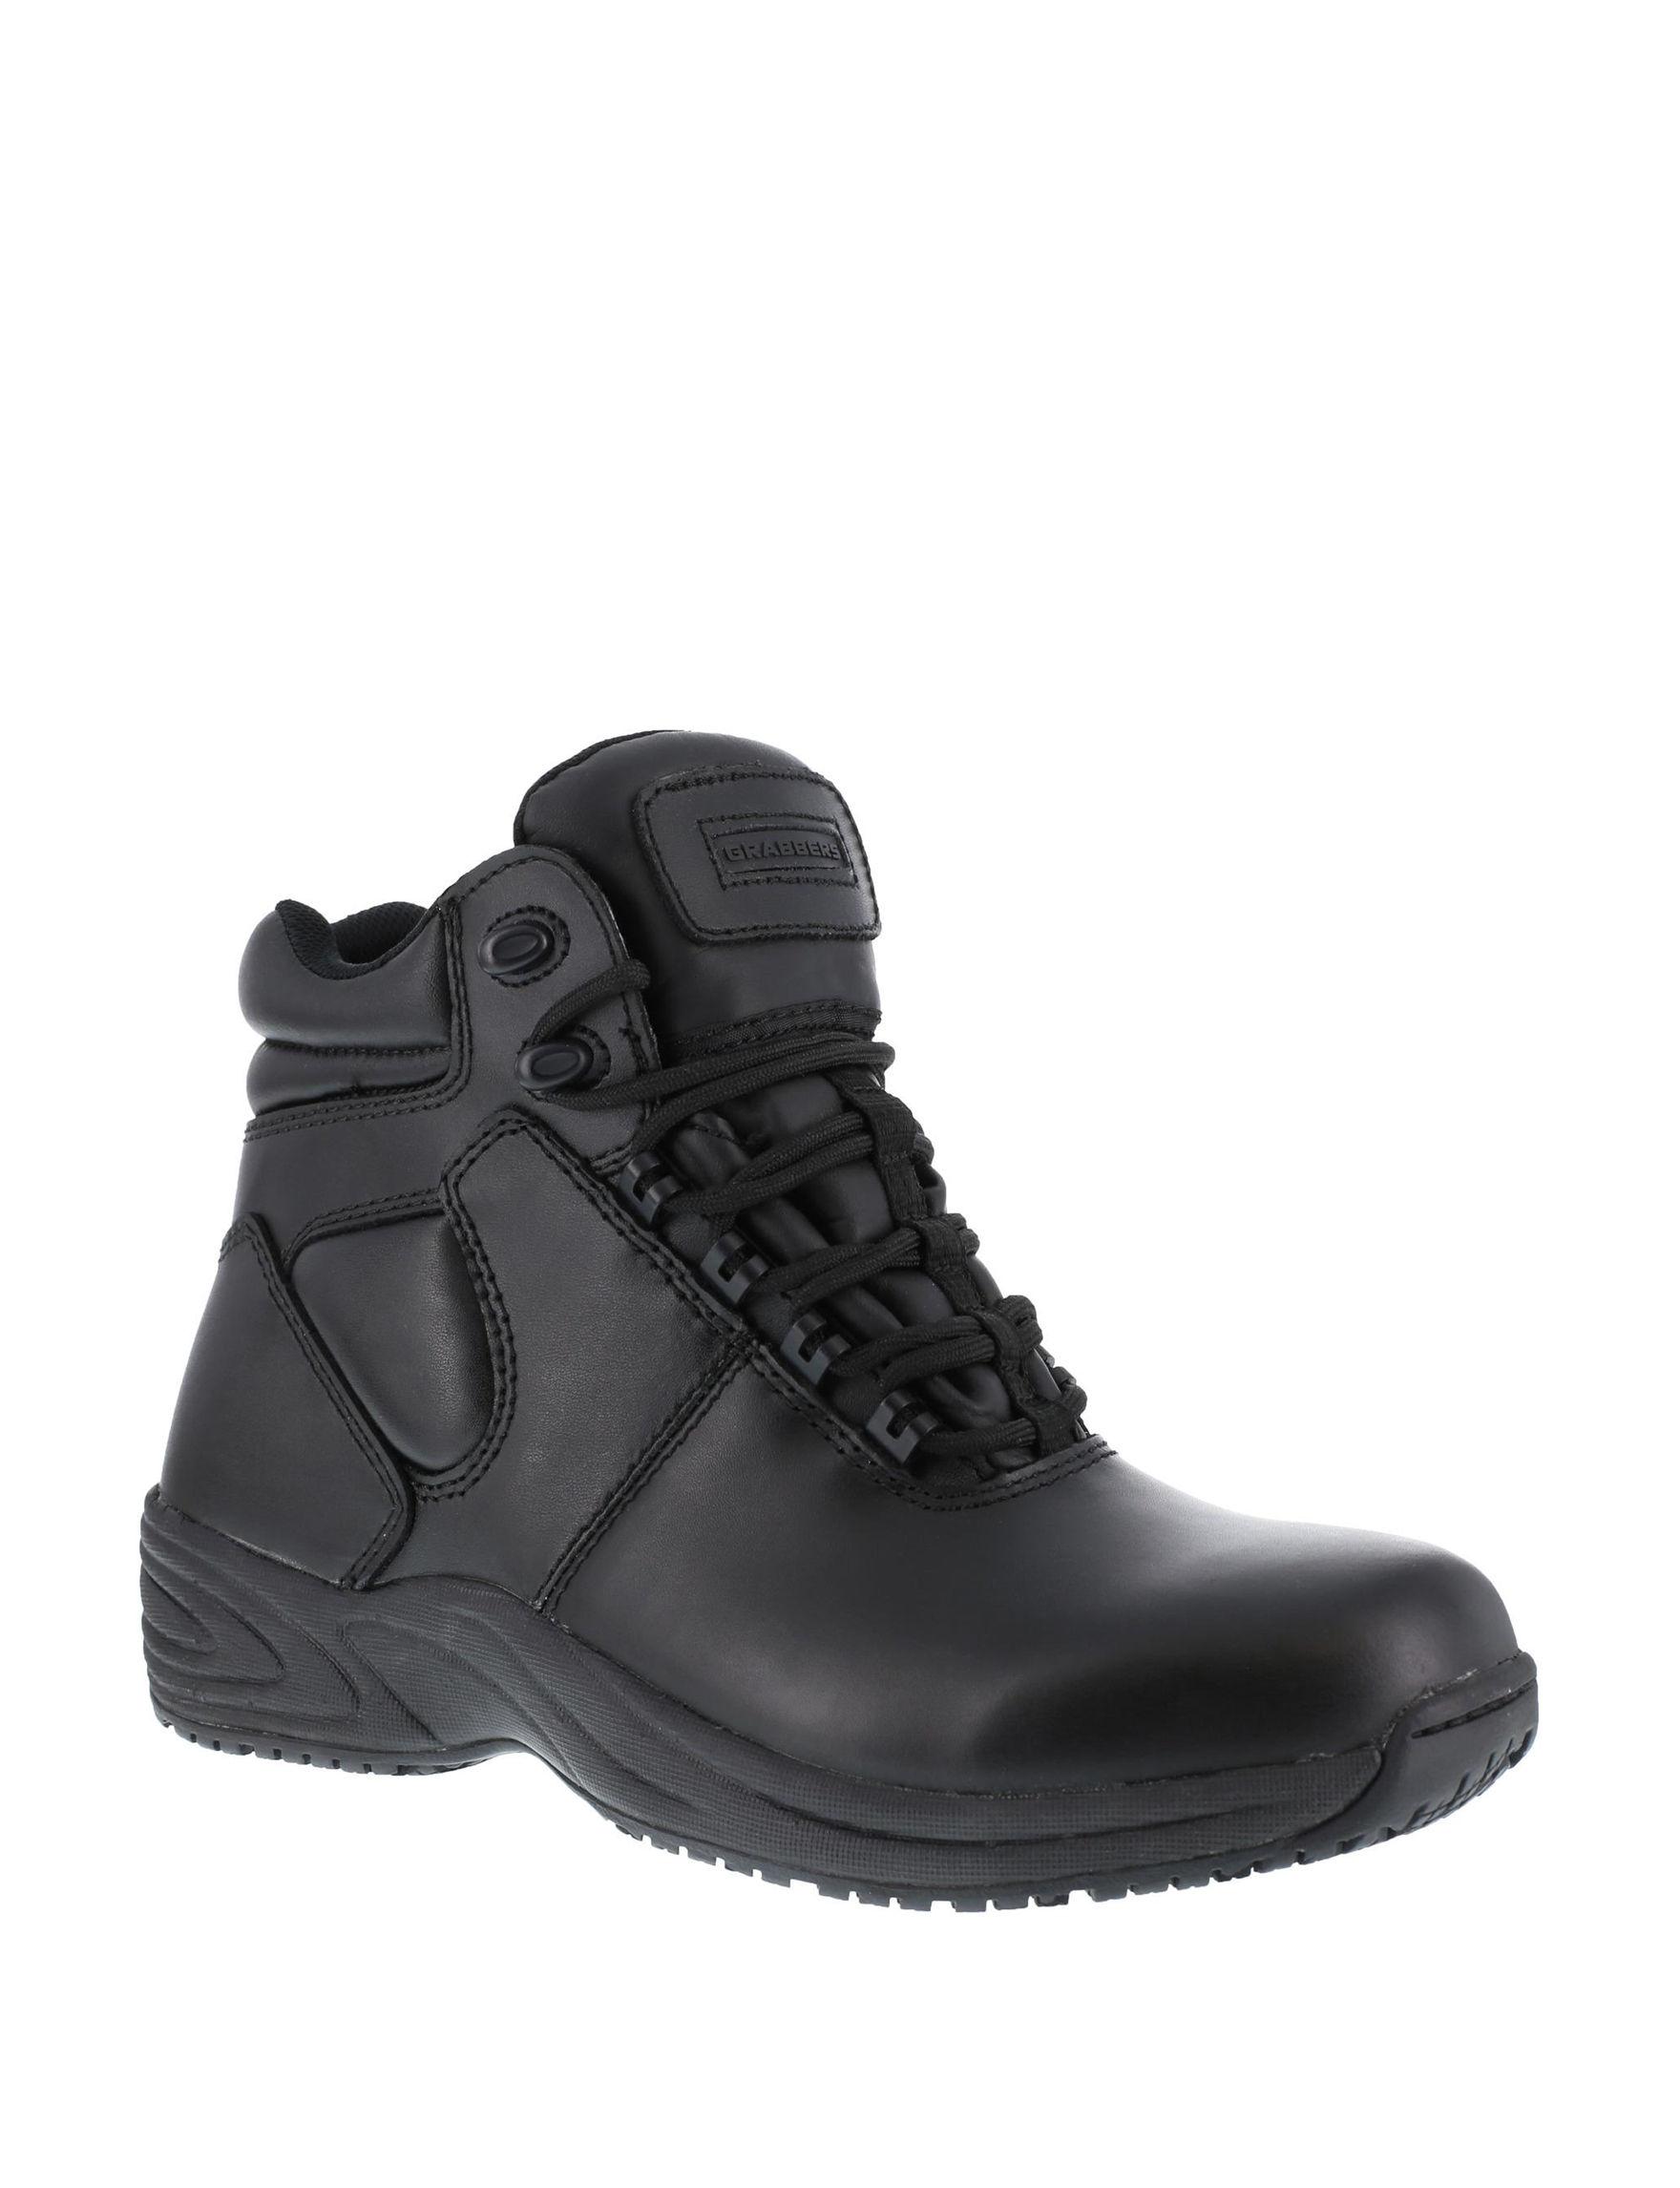 Grabbers Black Slip Resistant